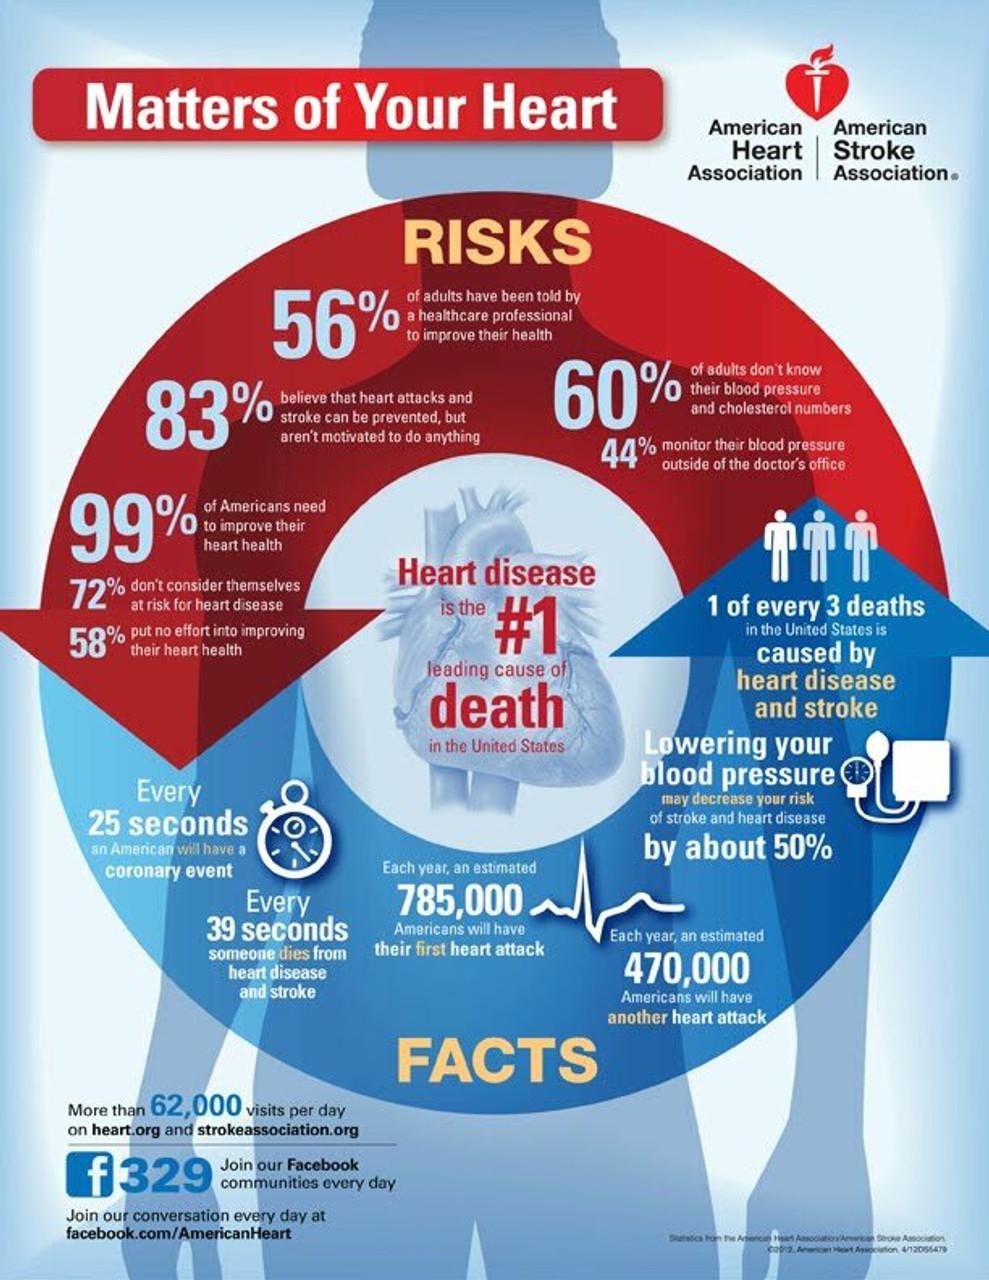 heart and circulatory diseases